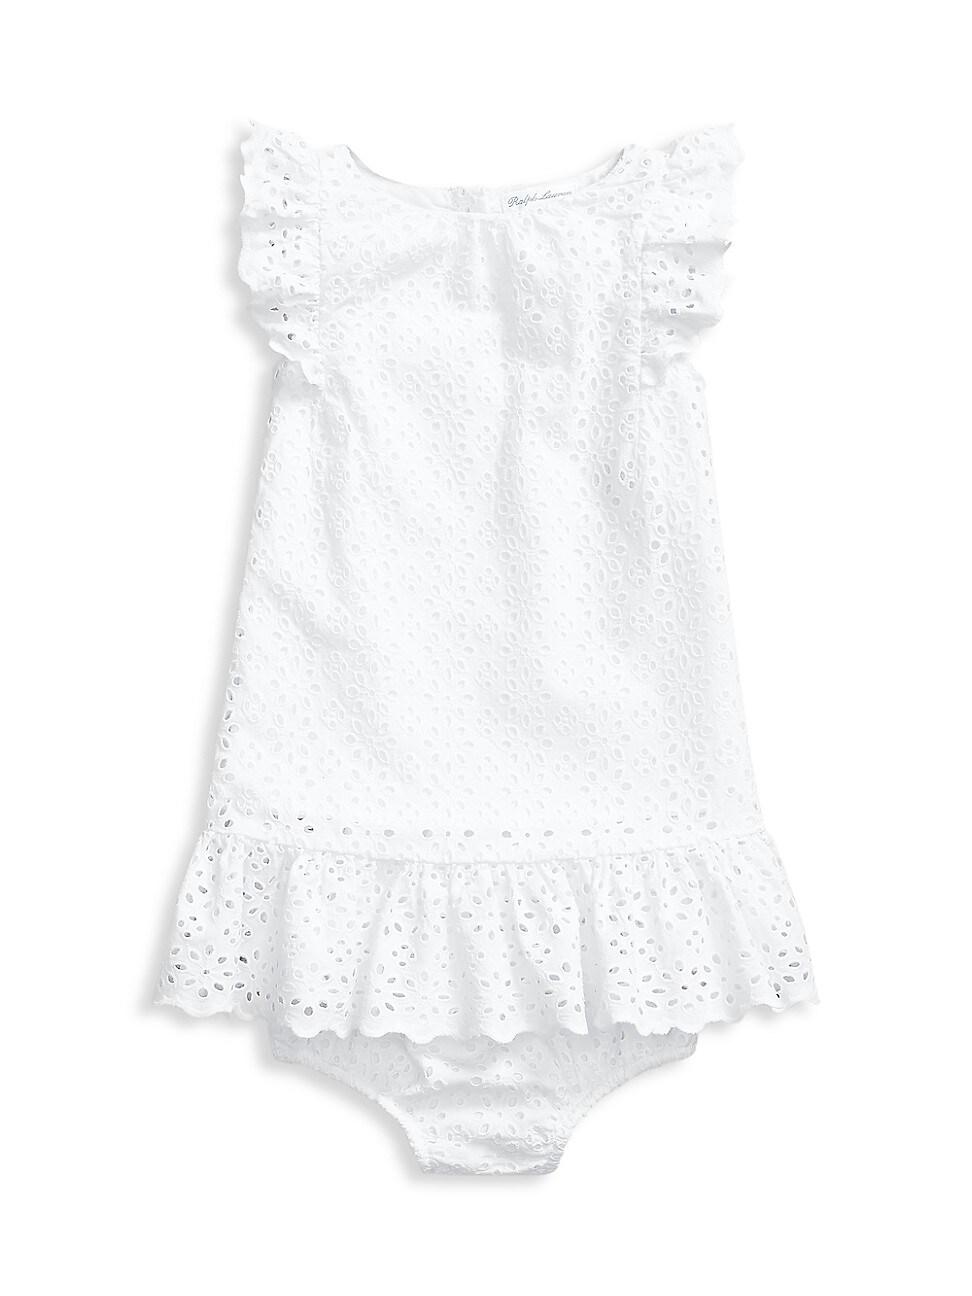 Ralph Lauren Baby Girl's 2-piece Eyelet Dress & Bloomers Set In White